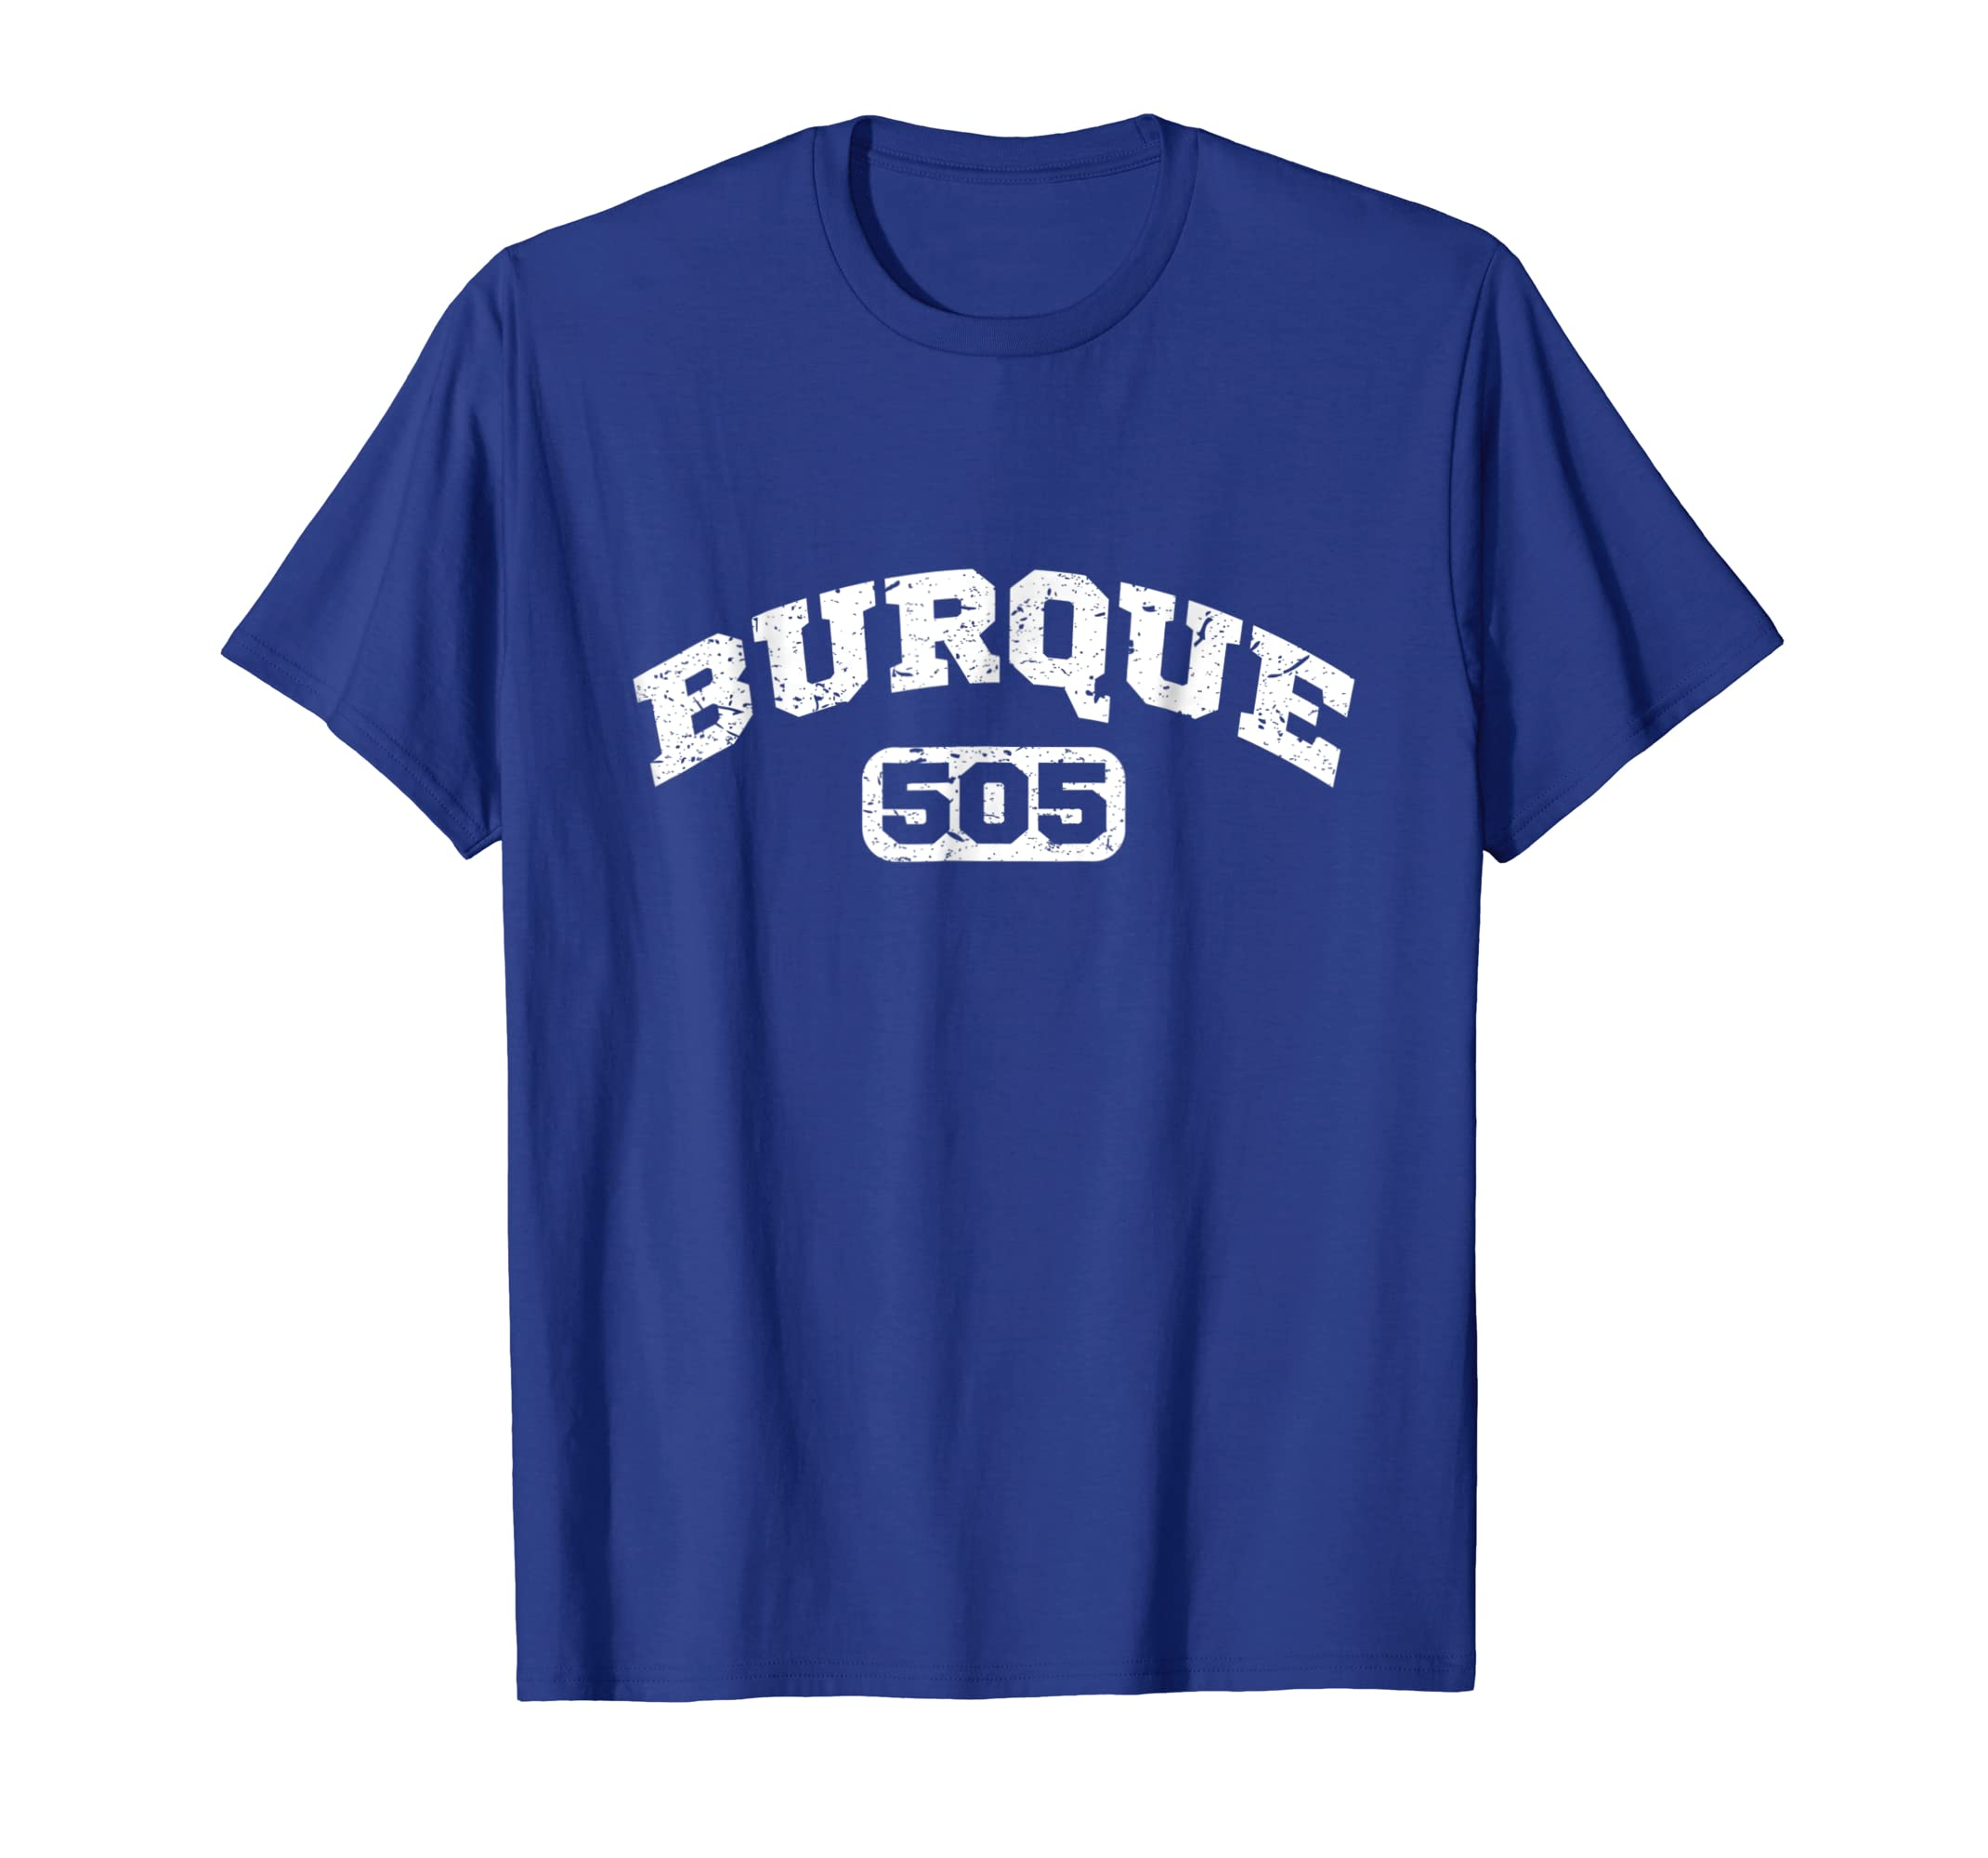 Amazon com: BURQUE Albuquerque, NM 505 Area Code T-Shirt New